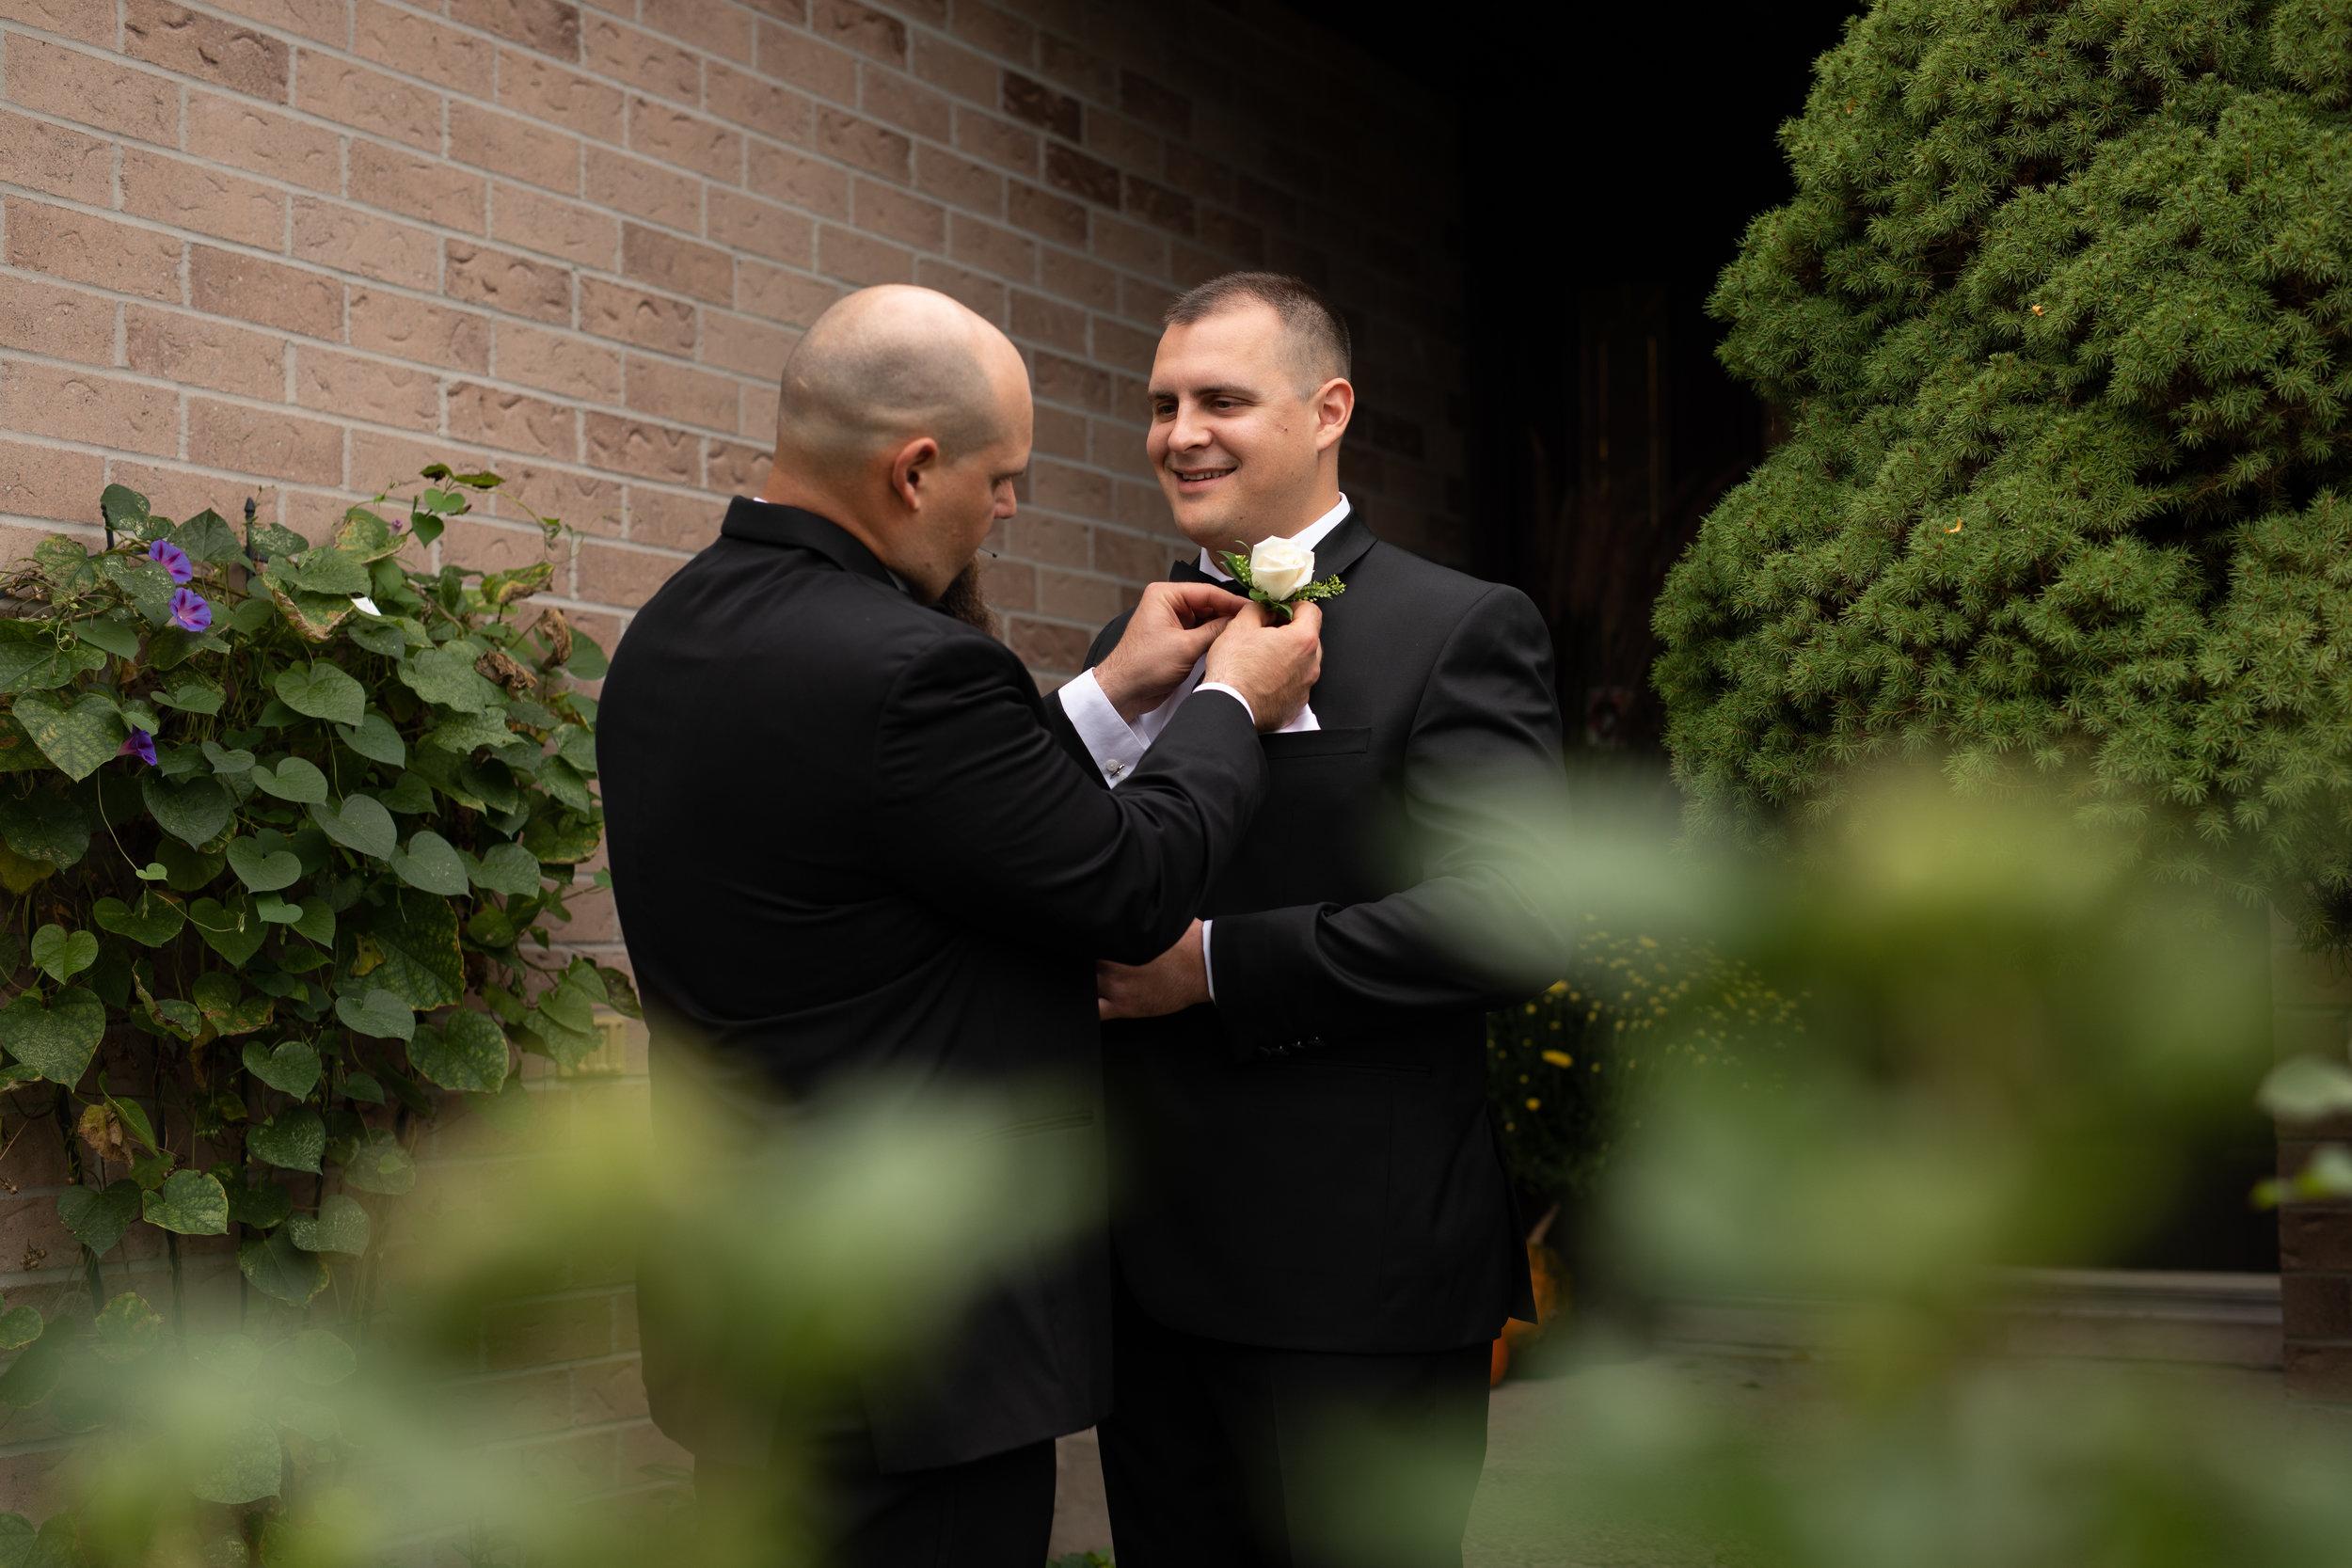 RBG Rock garden wedding photography with soundslikeyellowphotography